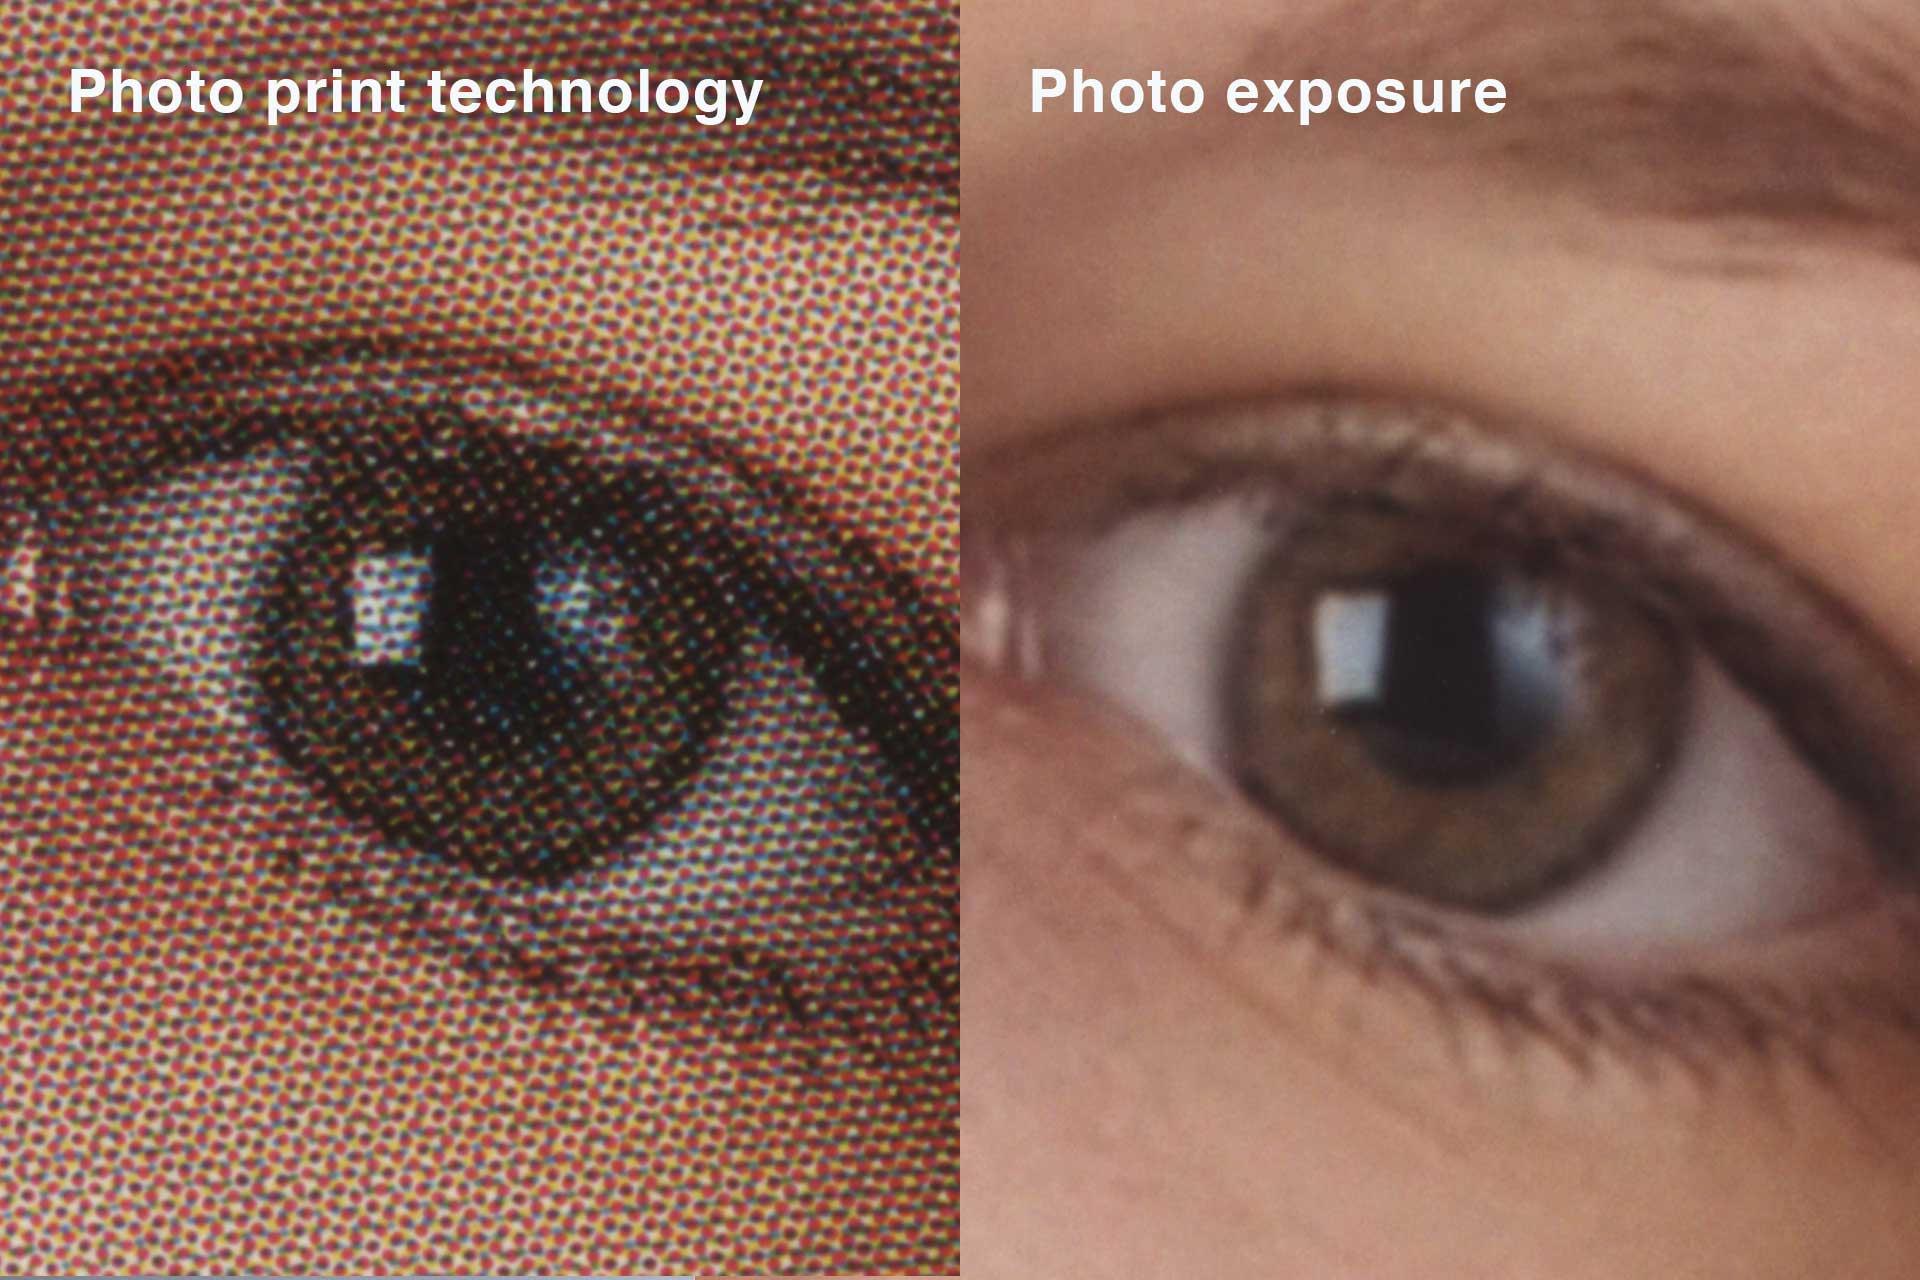 Photo exposure – long-lasting and brilliant